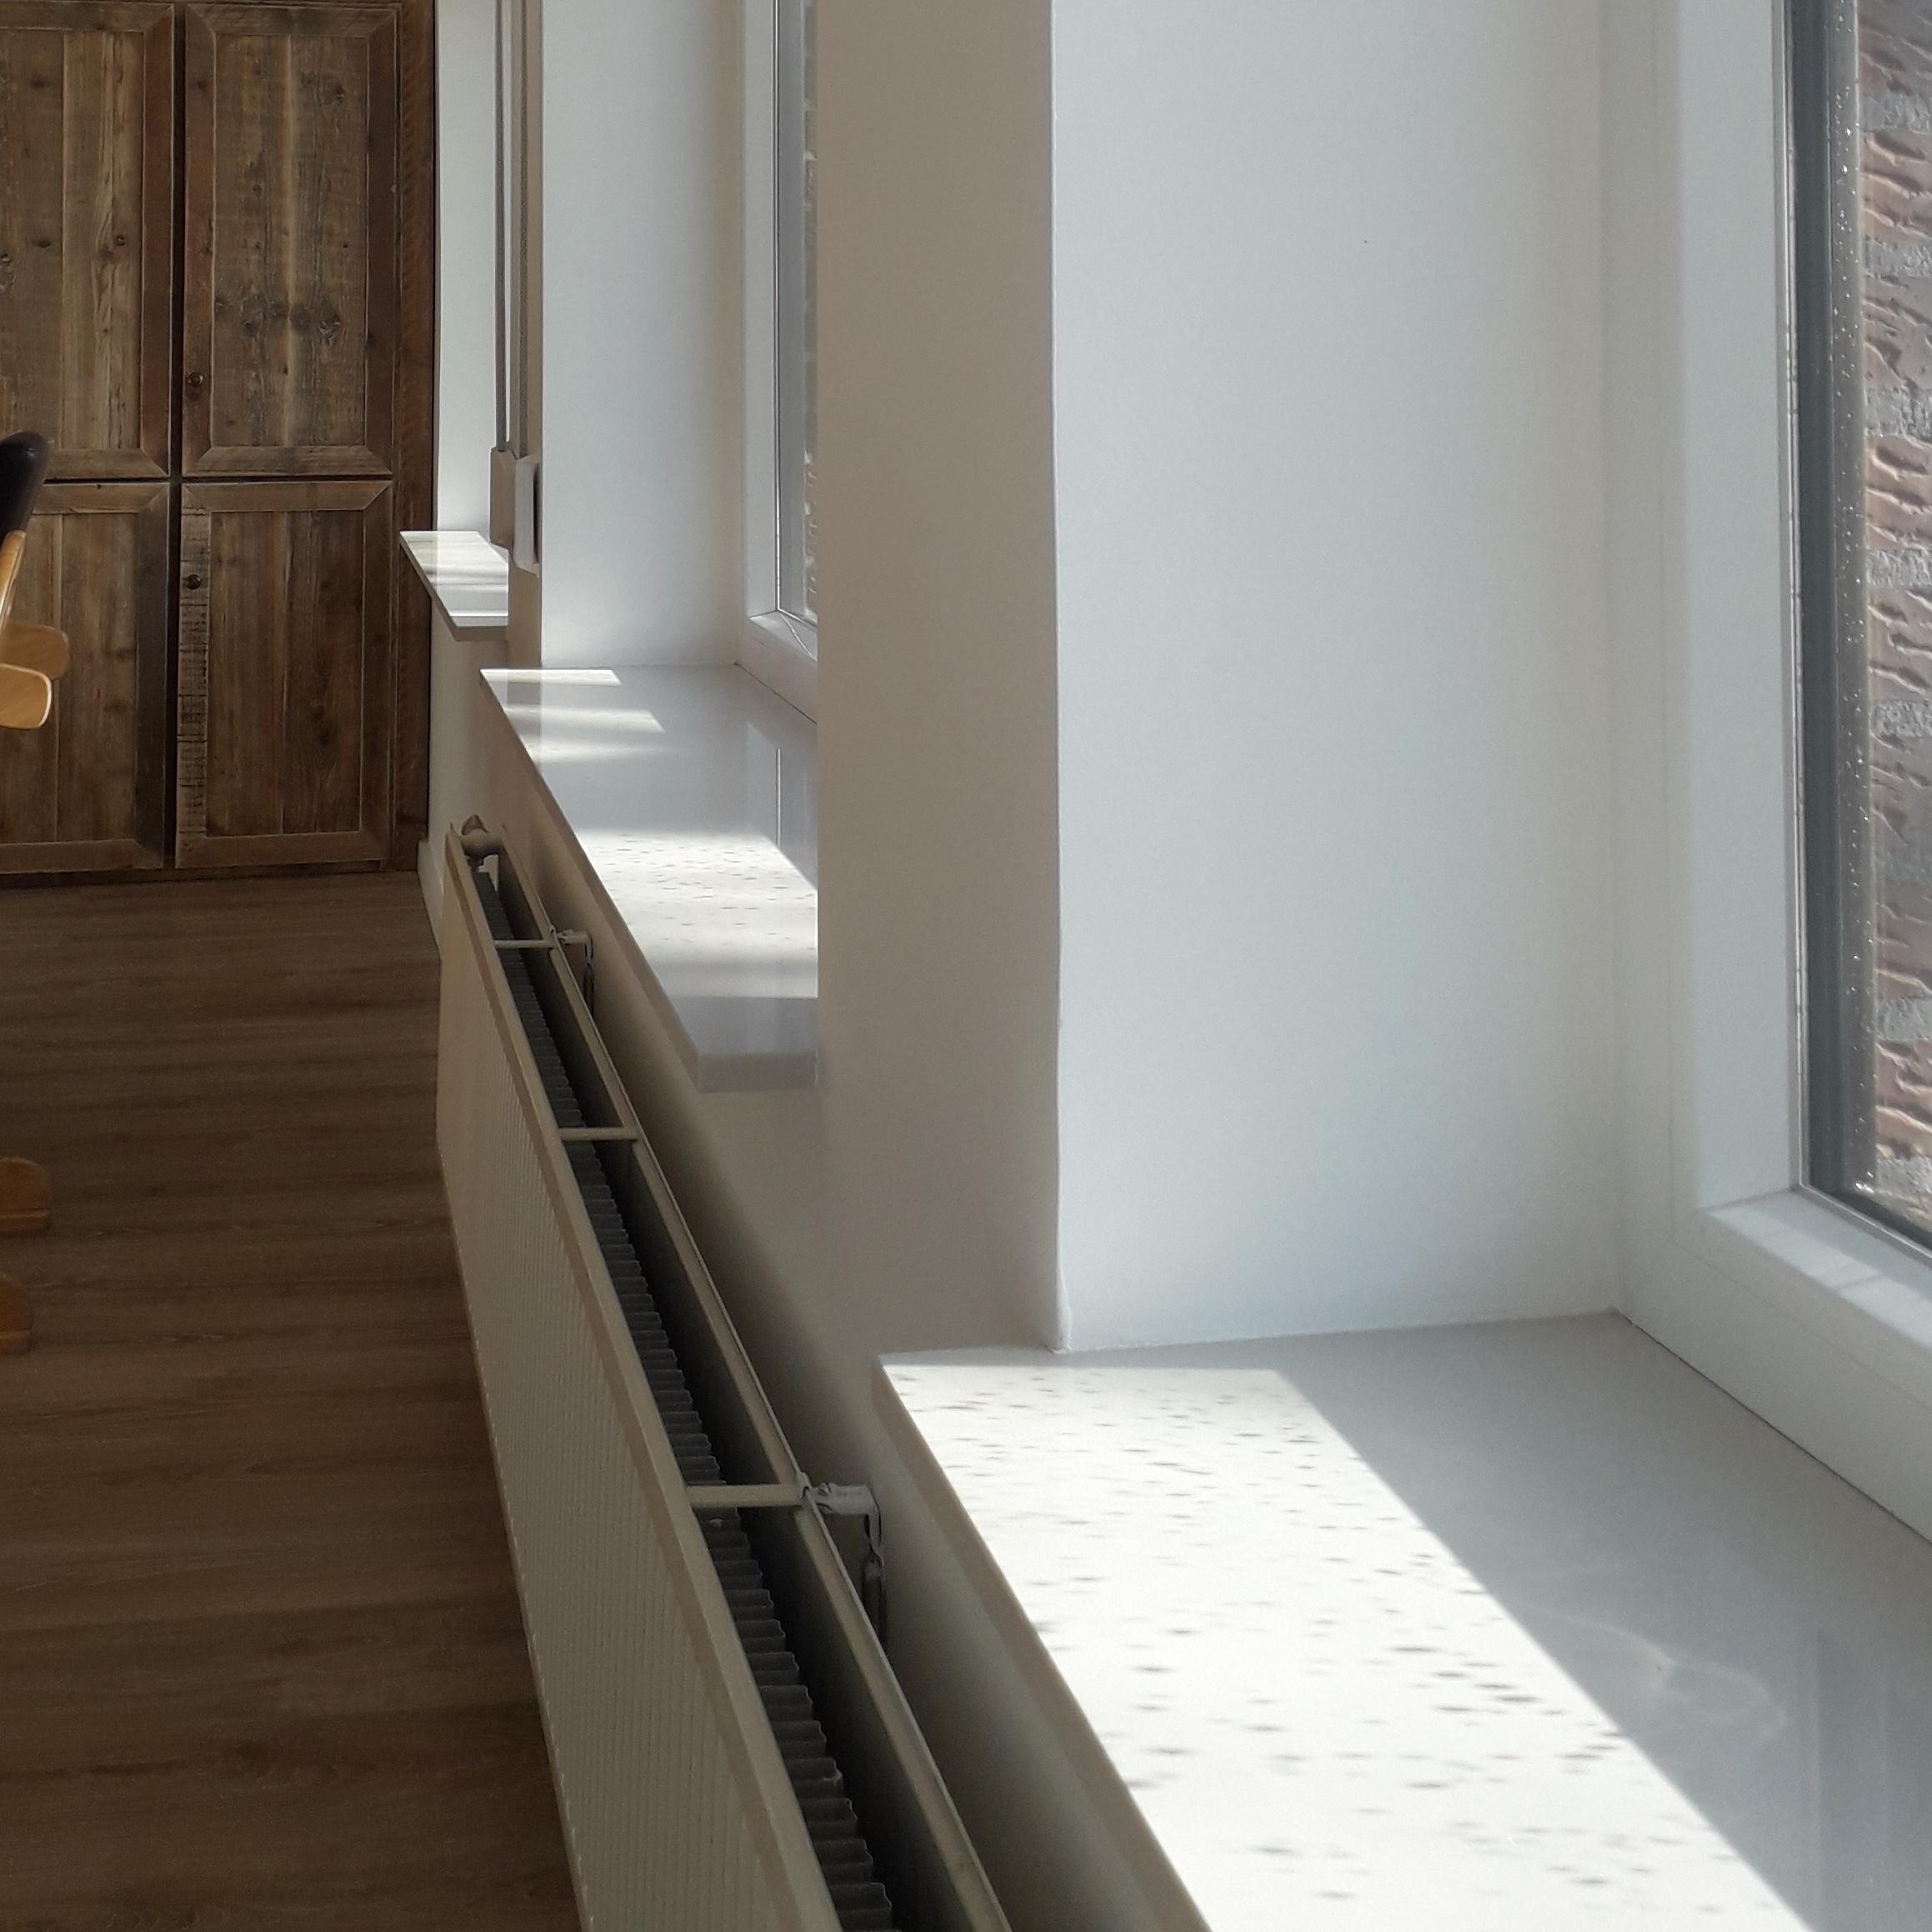 Vensterbank composiet White - OP MAAT - 2 cm dik - 10-70 cm breed - 10-230 cm lang -  Gepolijst marmer composiet wit